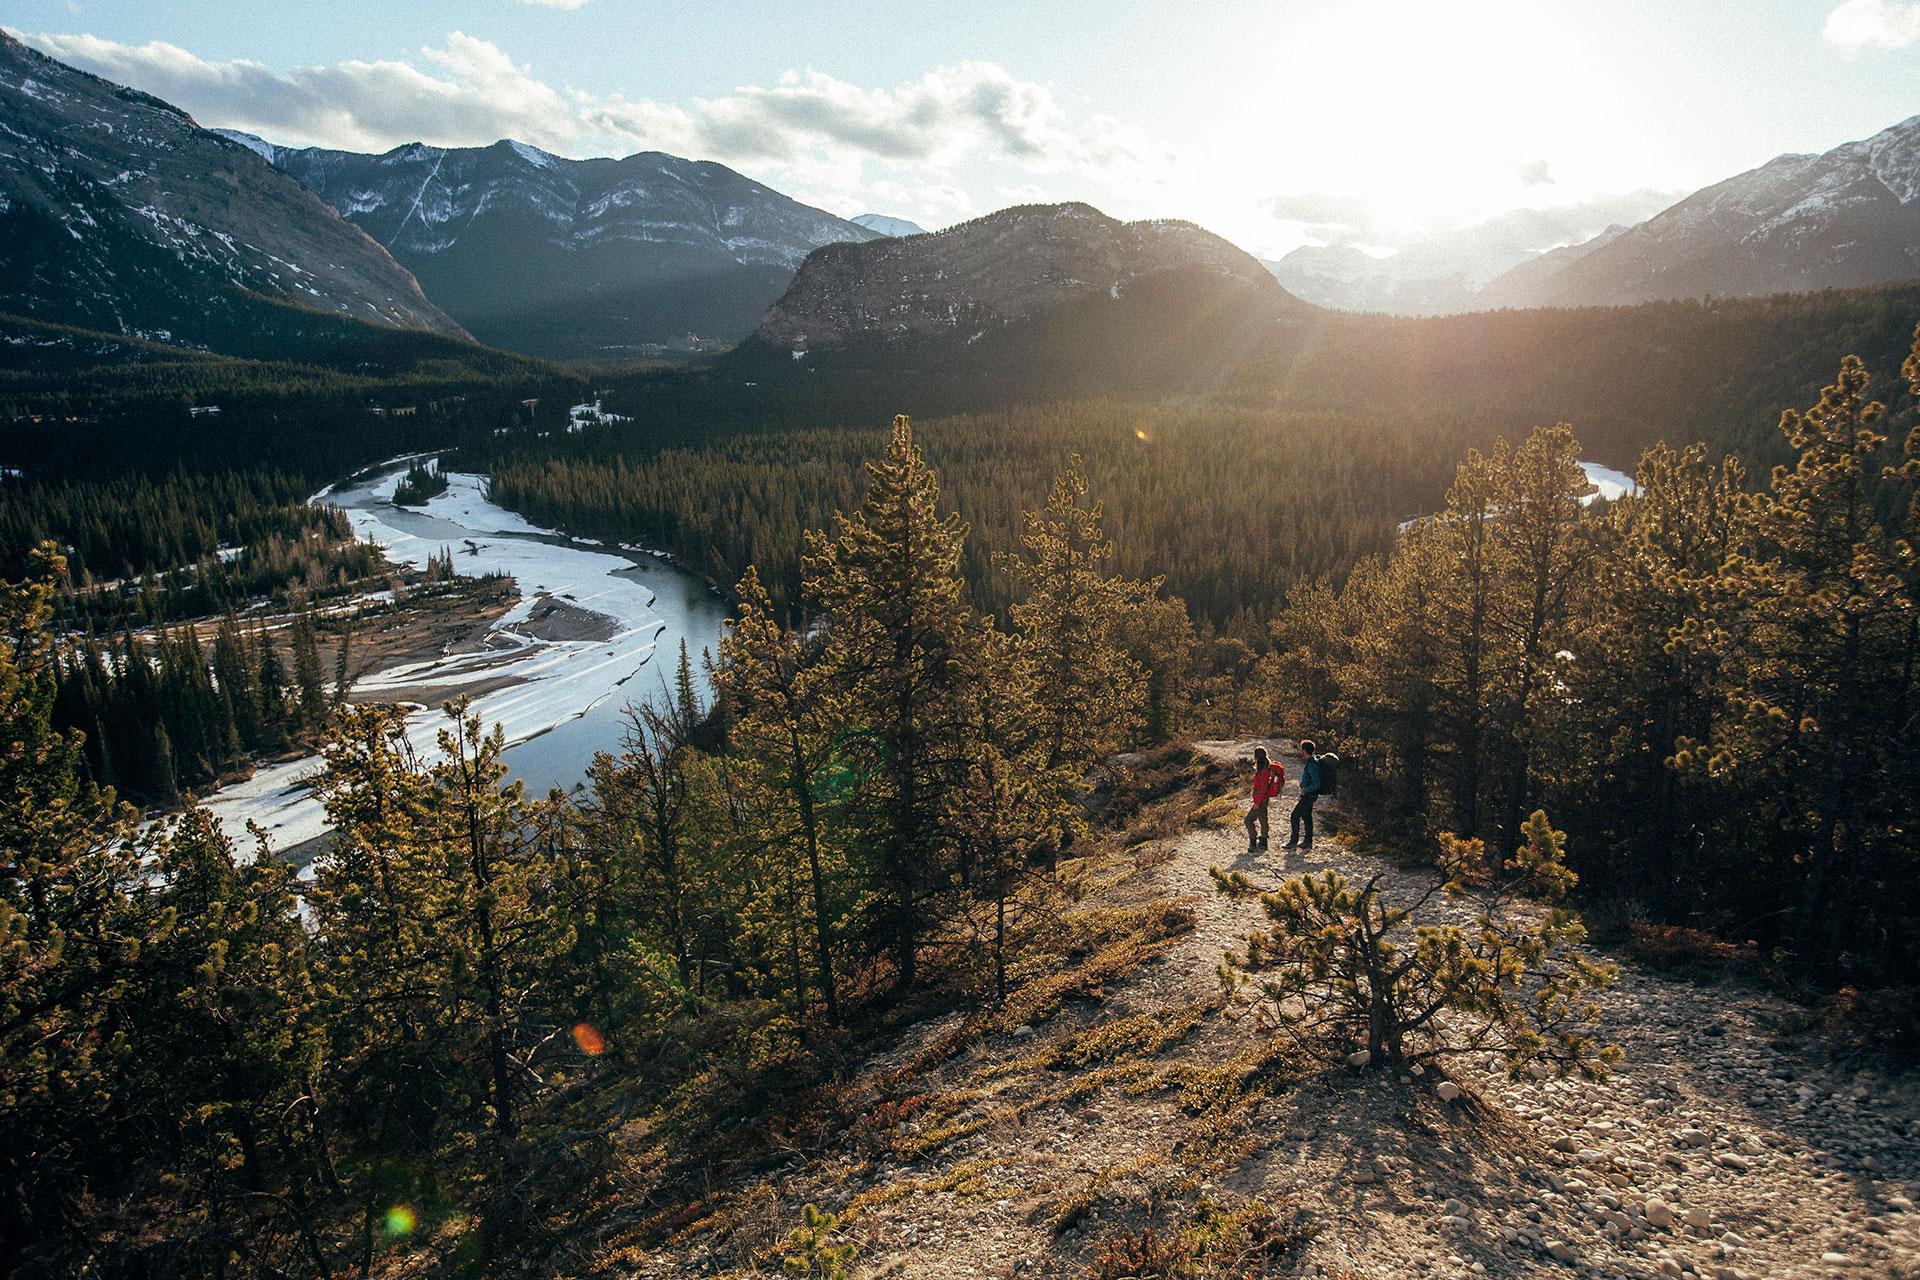 outdoor wandern fotografie banff fluss rocky mountains kanada deutschland berlin